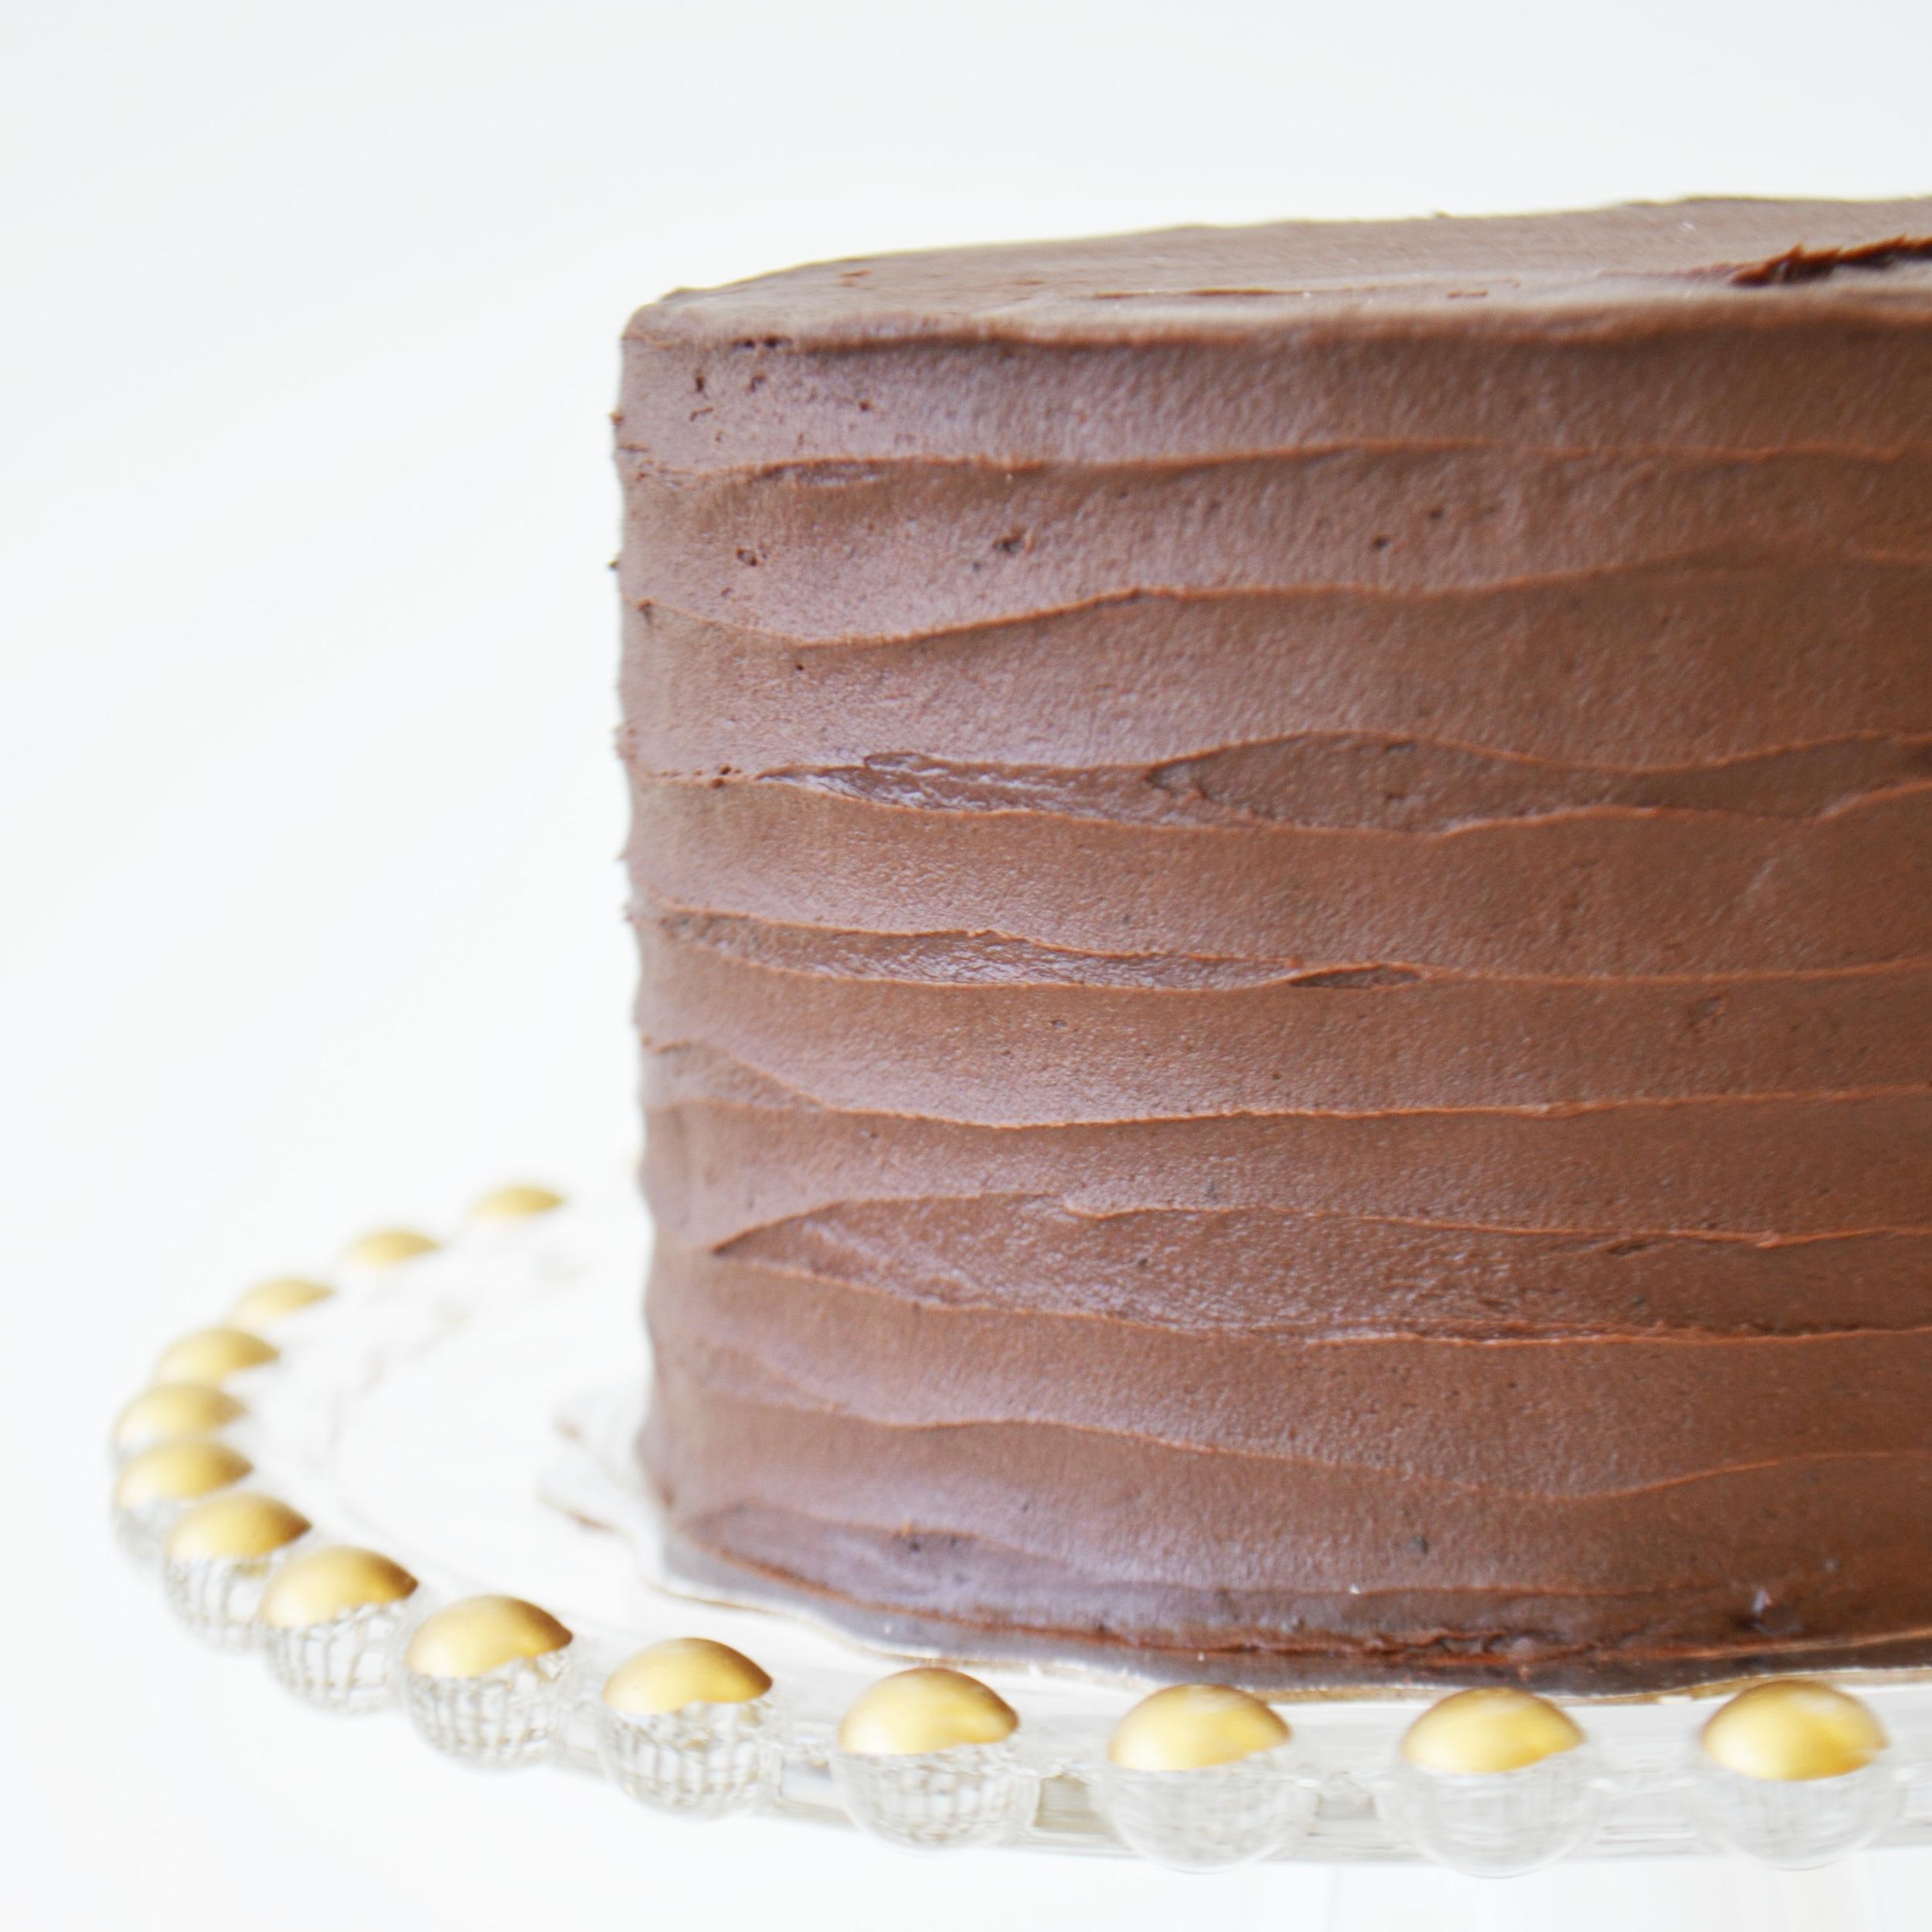 Chocolate Cake  - Moist chocolate cake layered with rich chocolate buttercream icing.